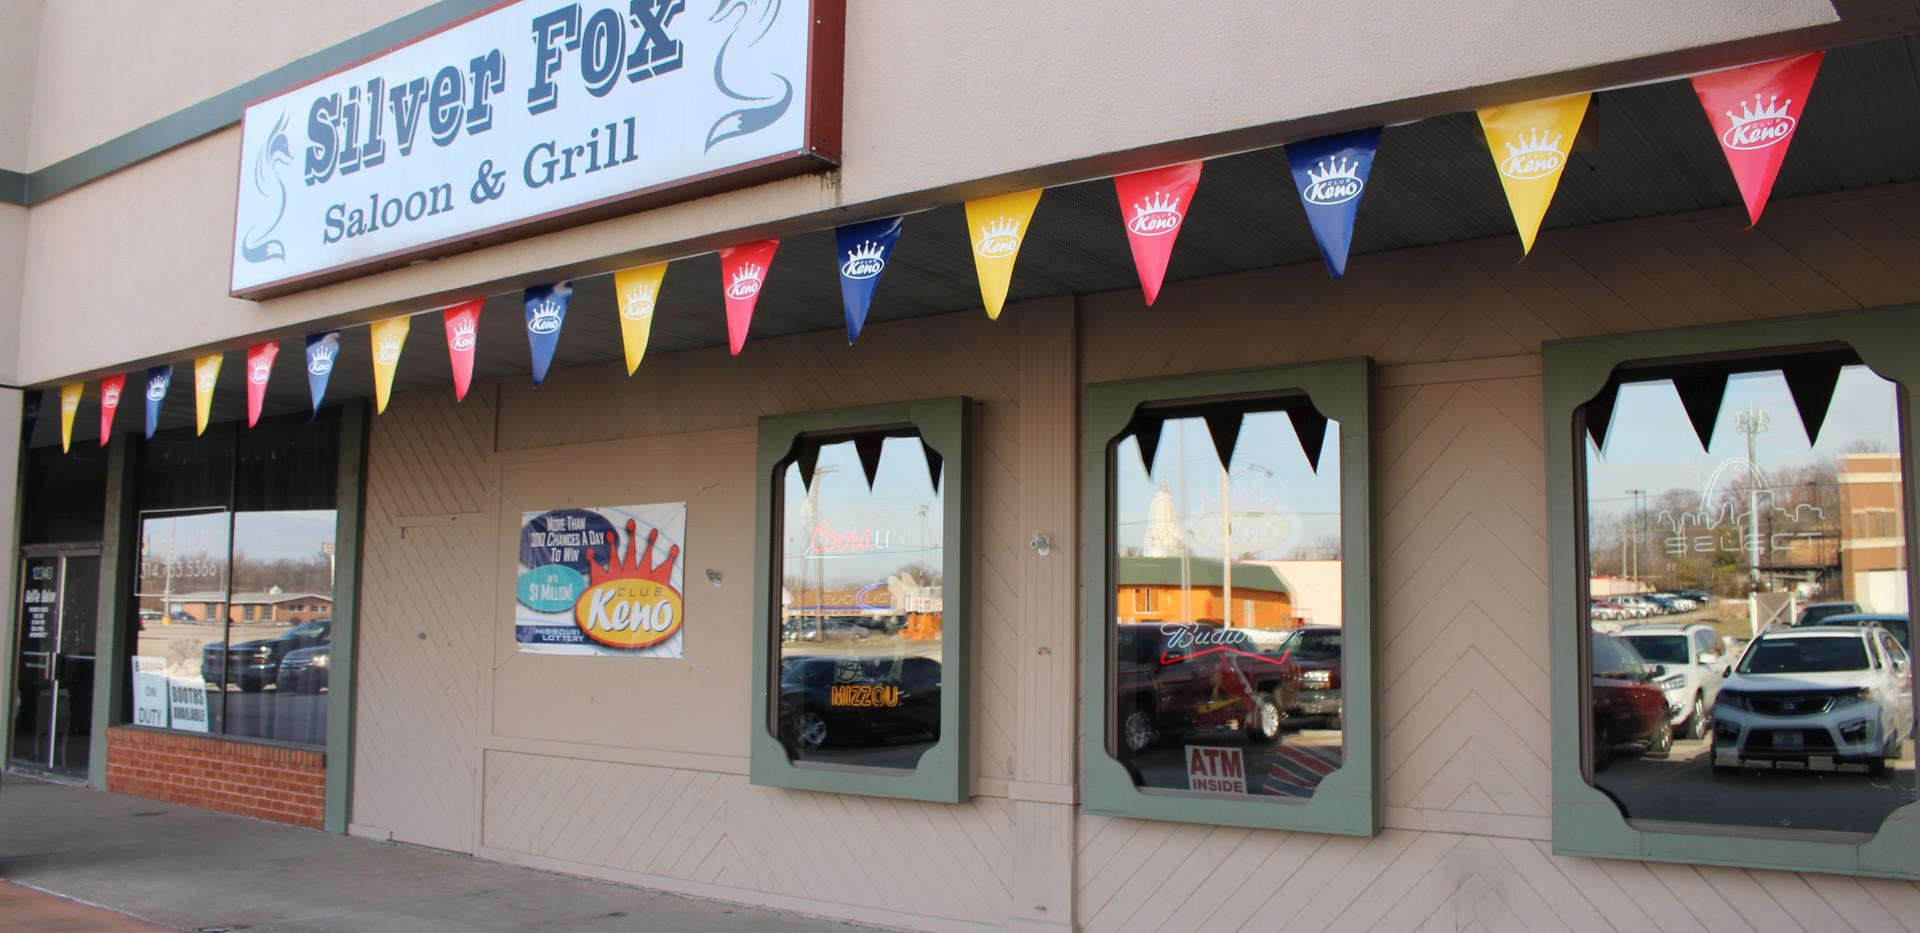 Silver Fox Saloon & Grill